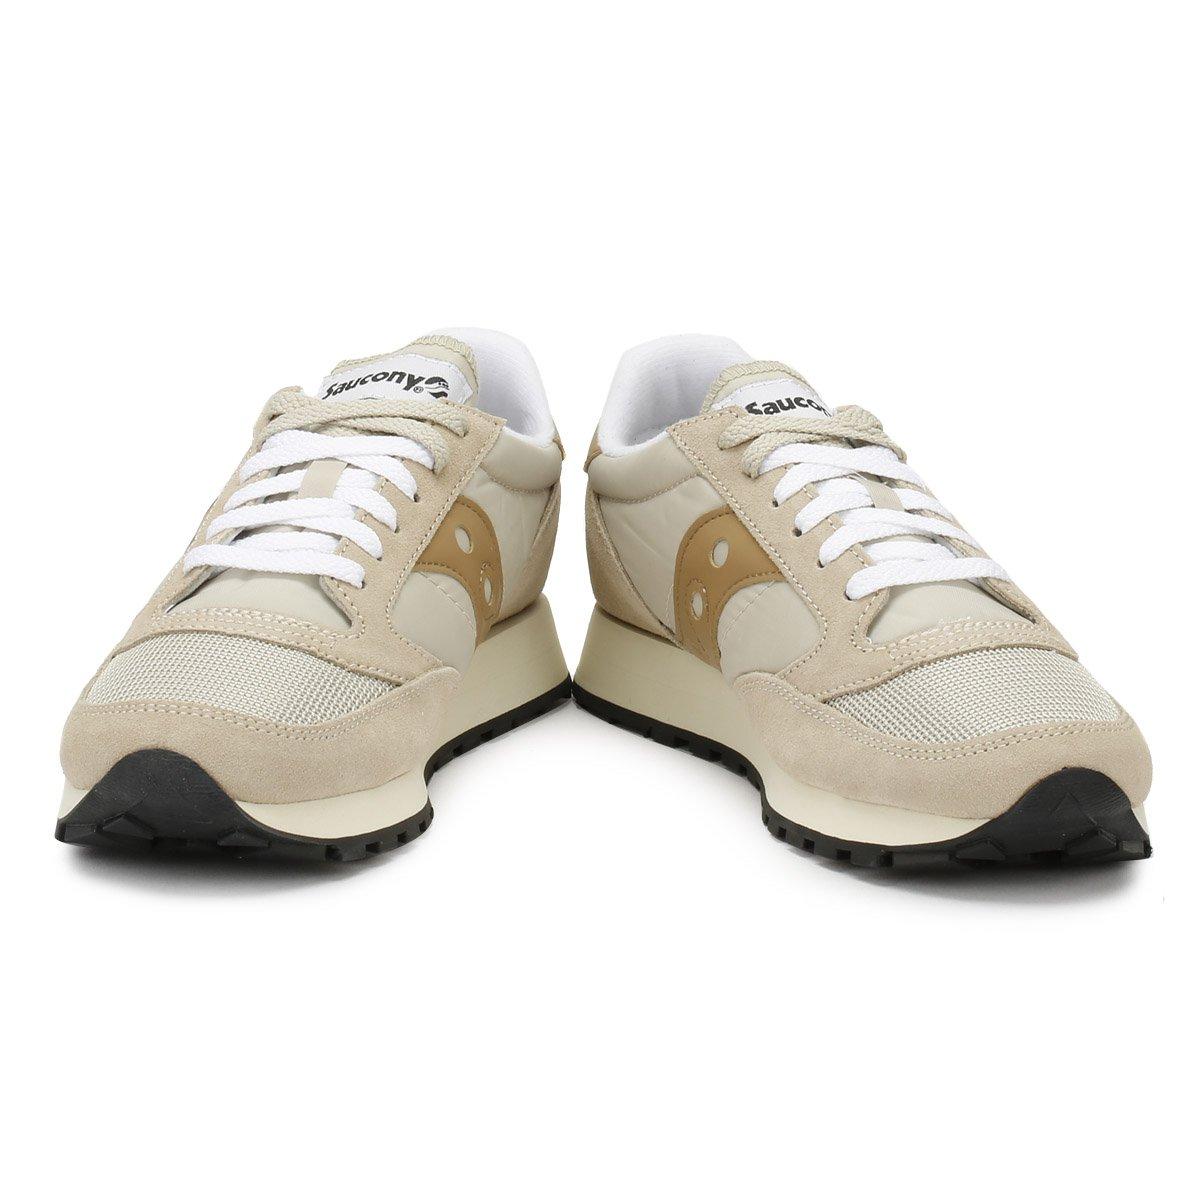 Saucony Jazz Original Vintage, scarpe da da da ginnastica Unisex – Adulto   Acquisto  836d70